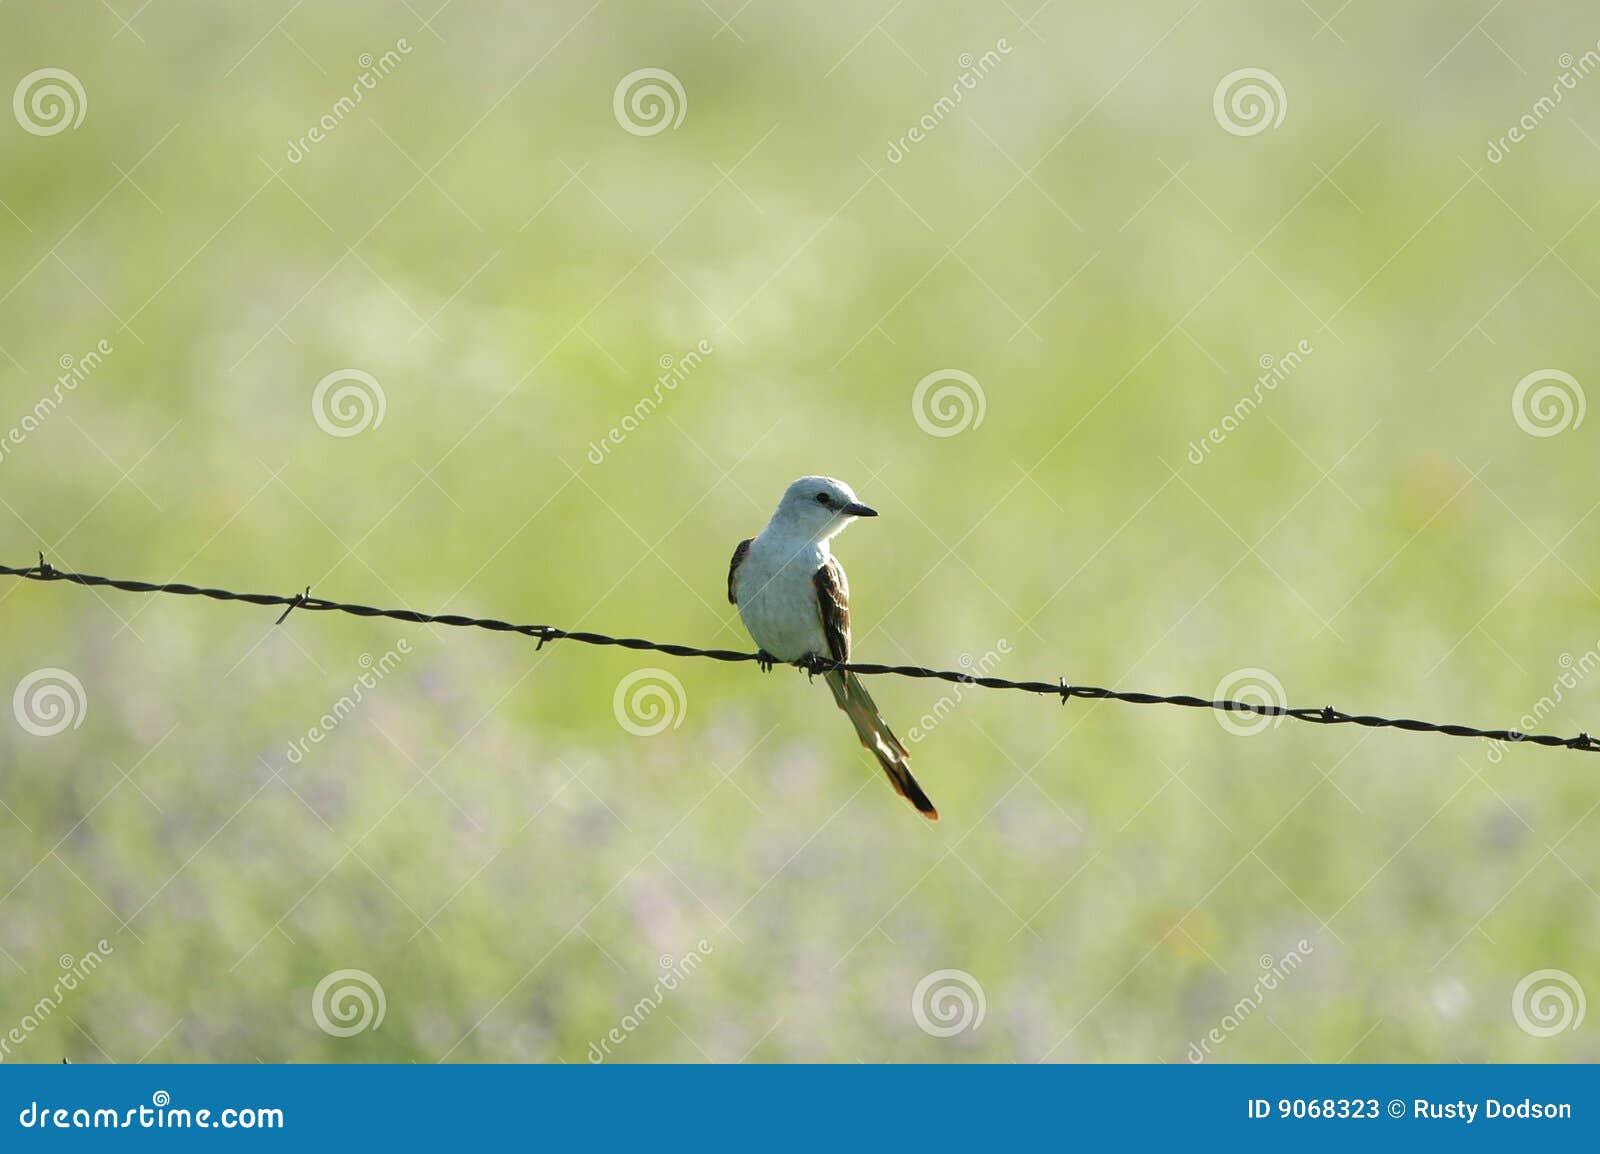 Scissor tailed flycatcher clipart - photo#24